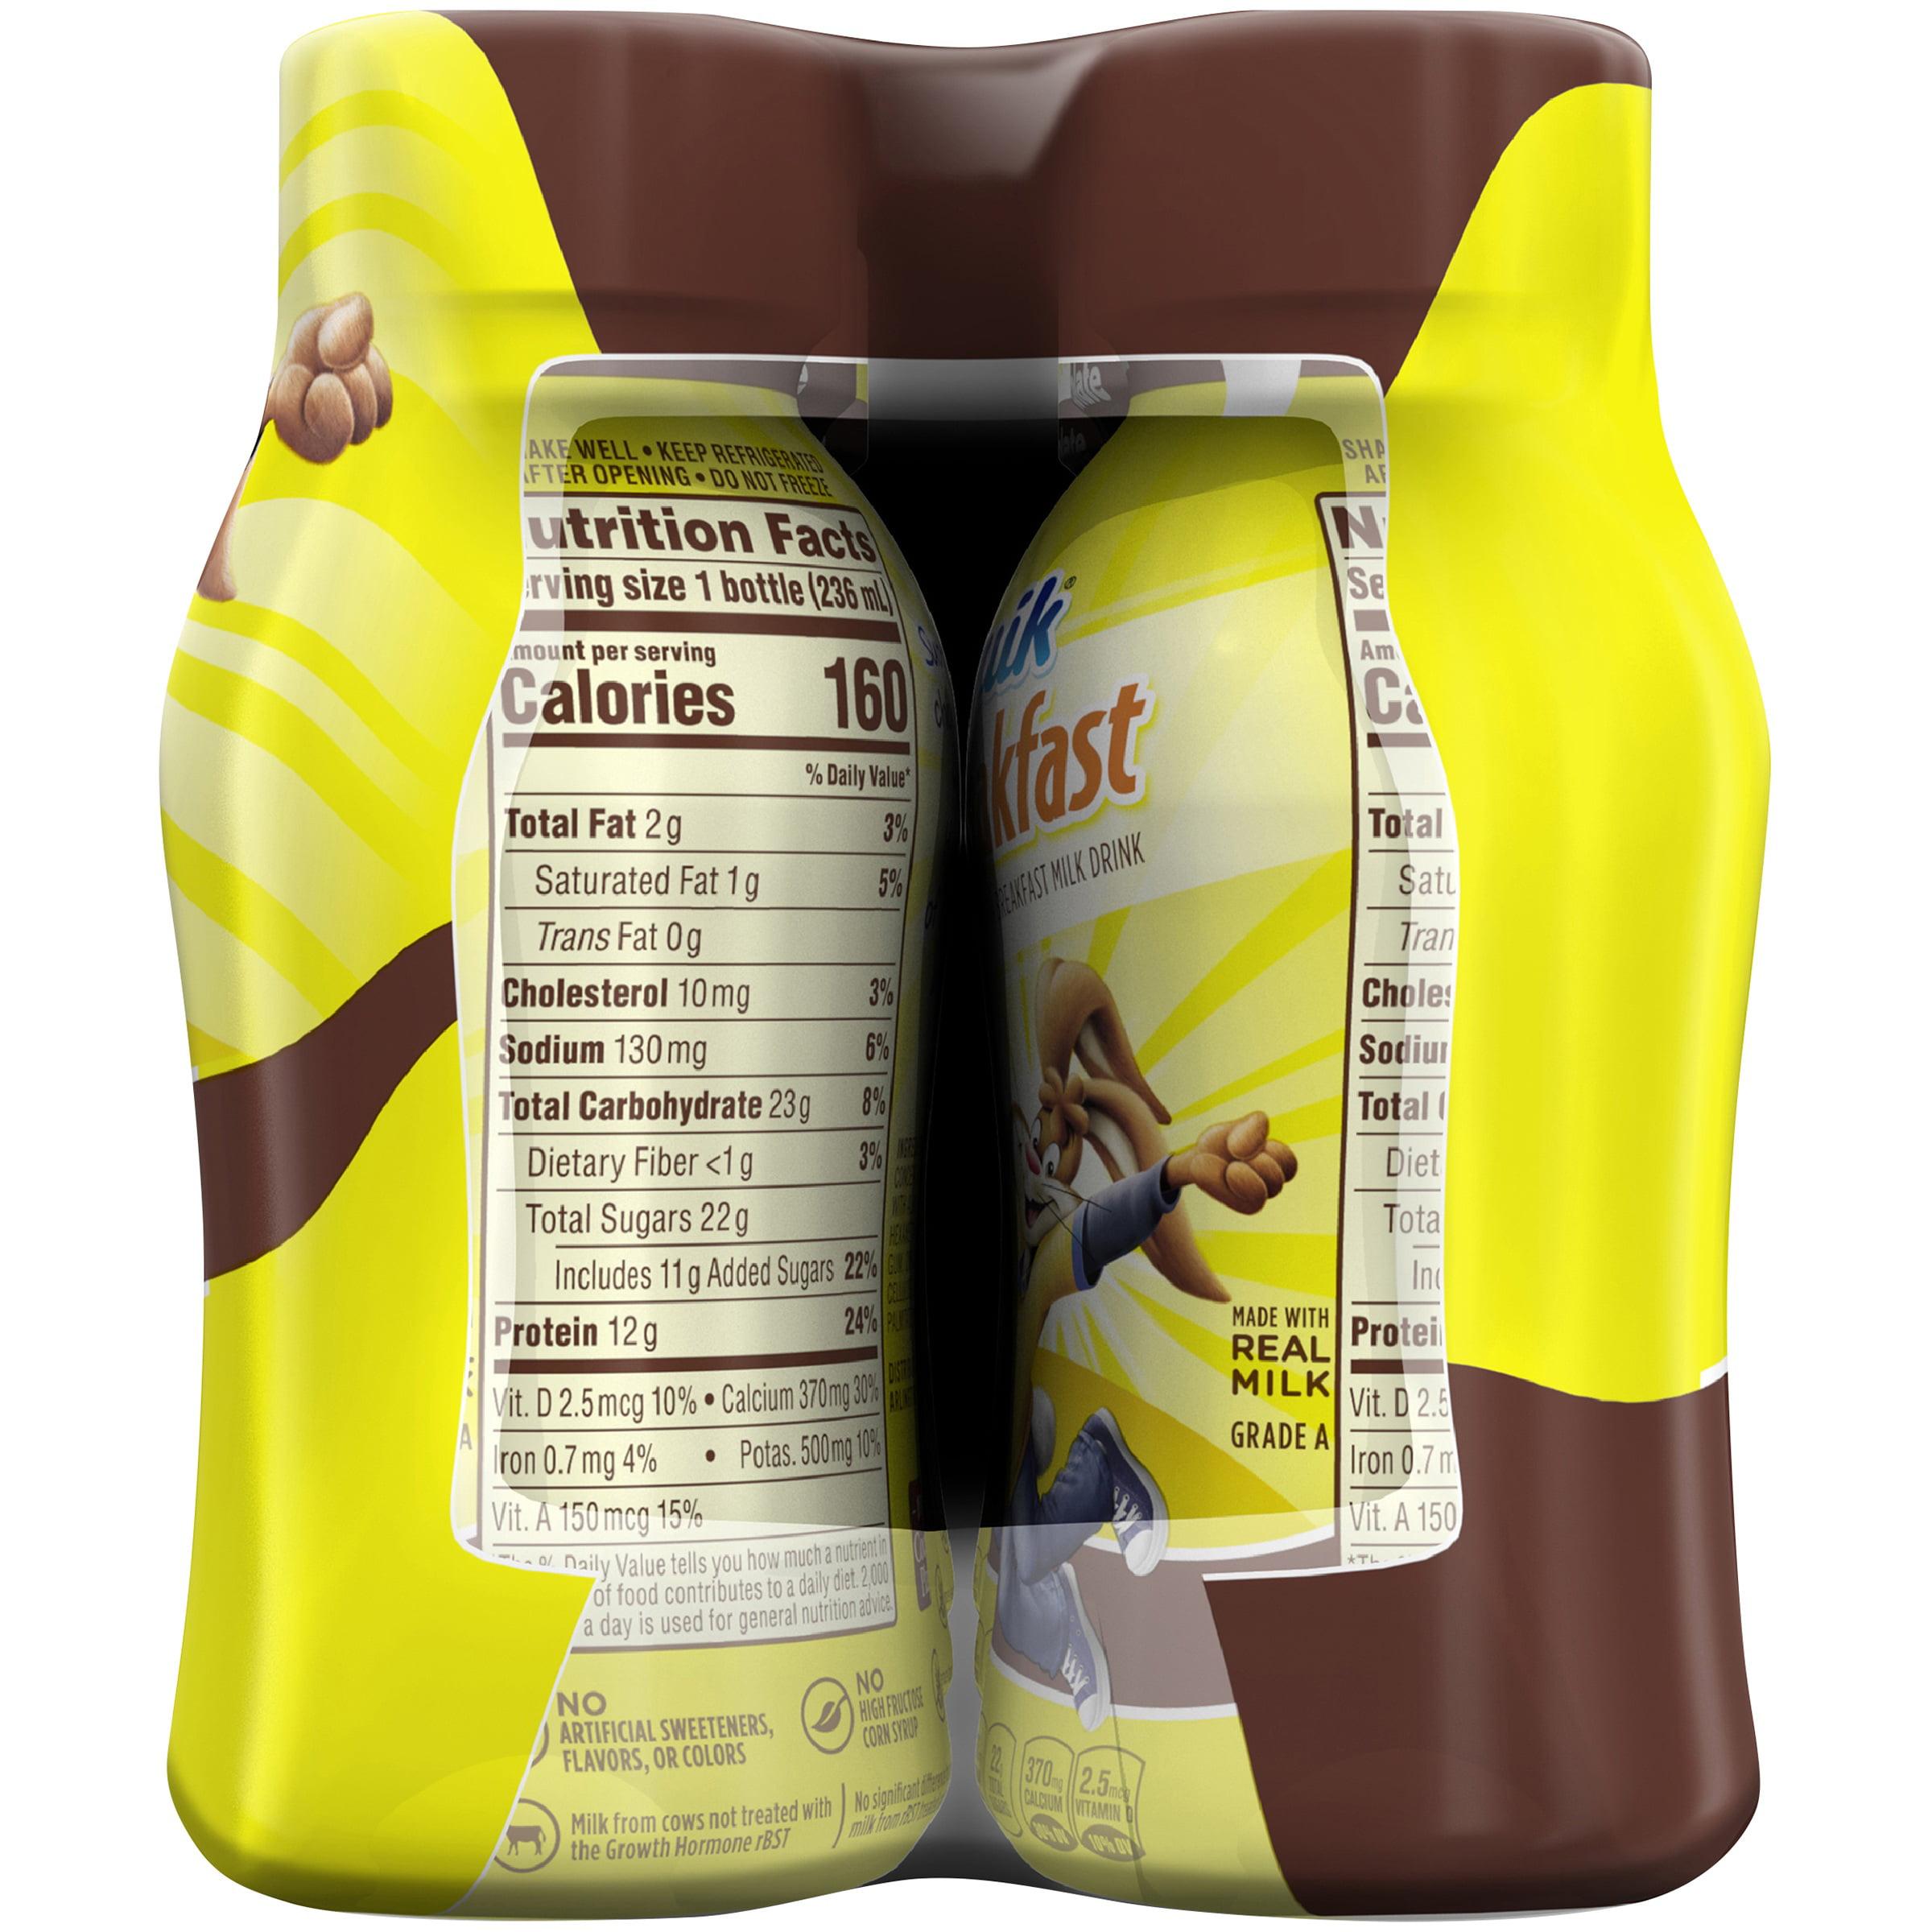 NESQUIK SUPERBREAKFAST Protein Breakfast Milk Drink, Chocolate – Portable Breakfast Drink with Real, Wholesome Milk, No Artificial Sweeteners, ...